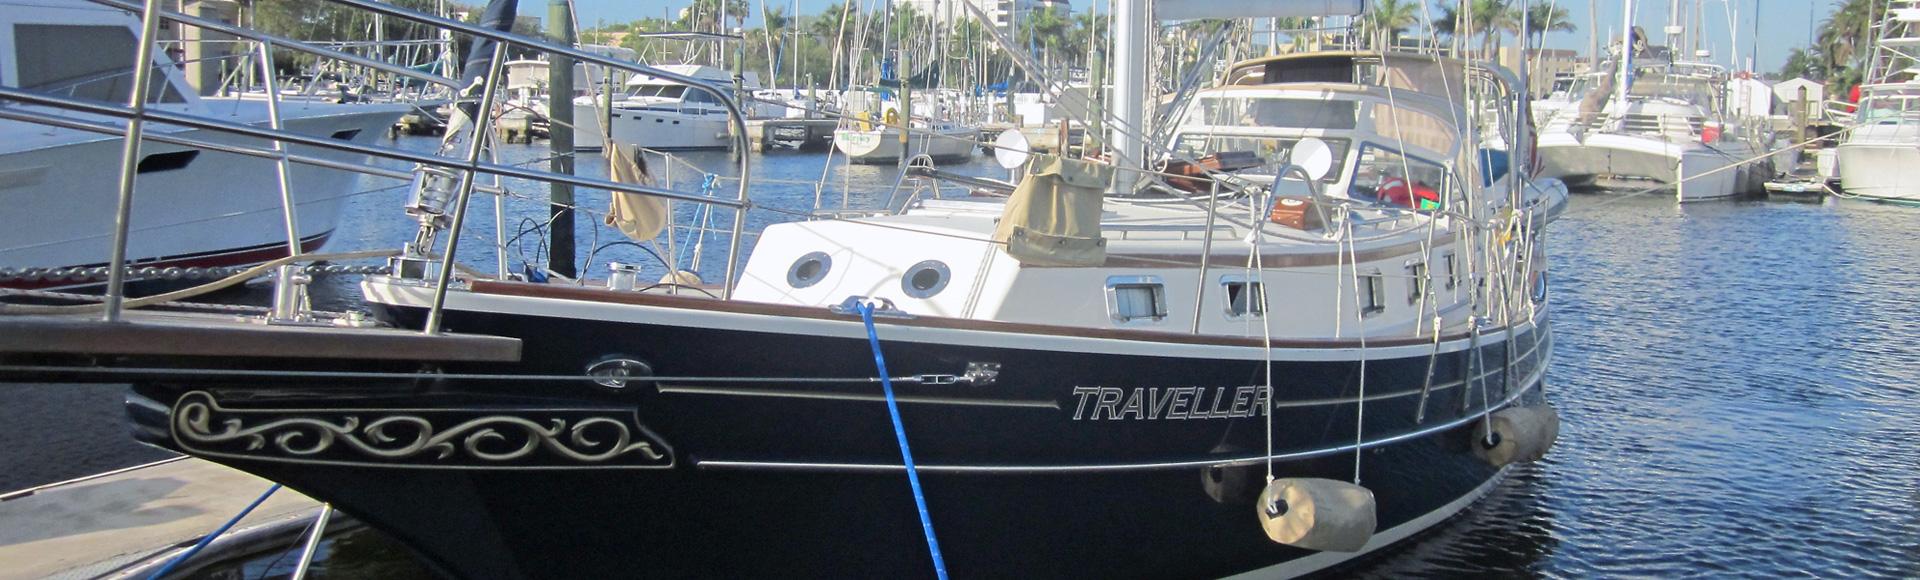 "SOLD Spring 2021 – 2002 Gozzard 37A Hull #12 ""Traveller"""